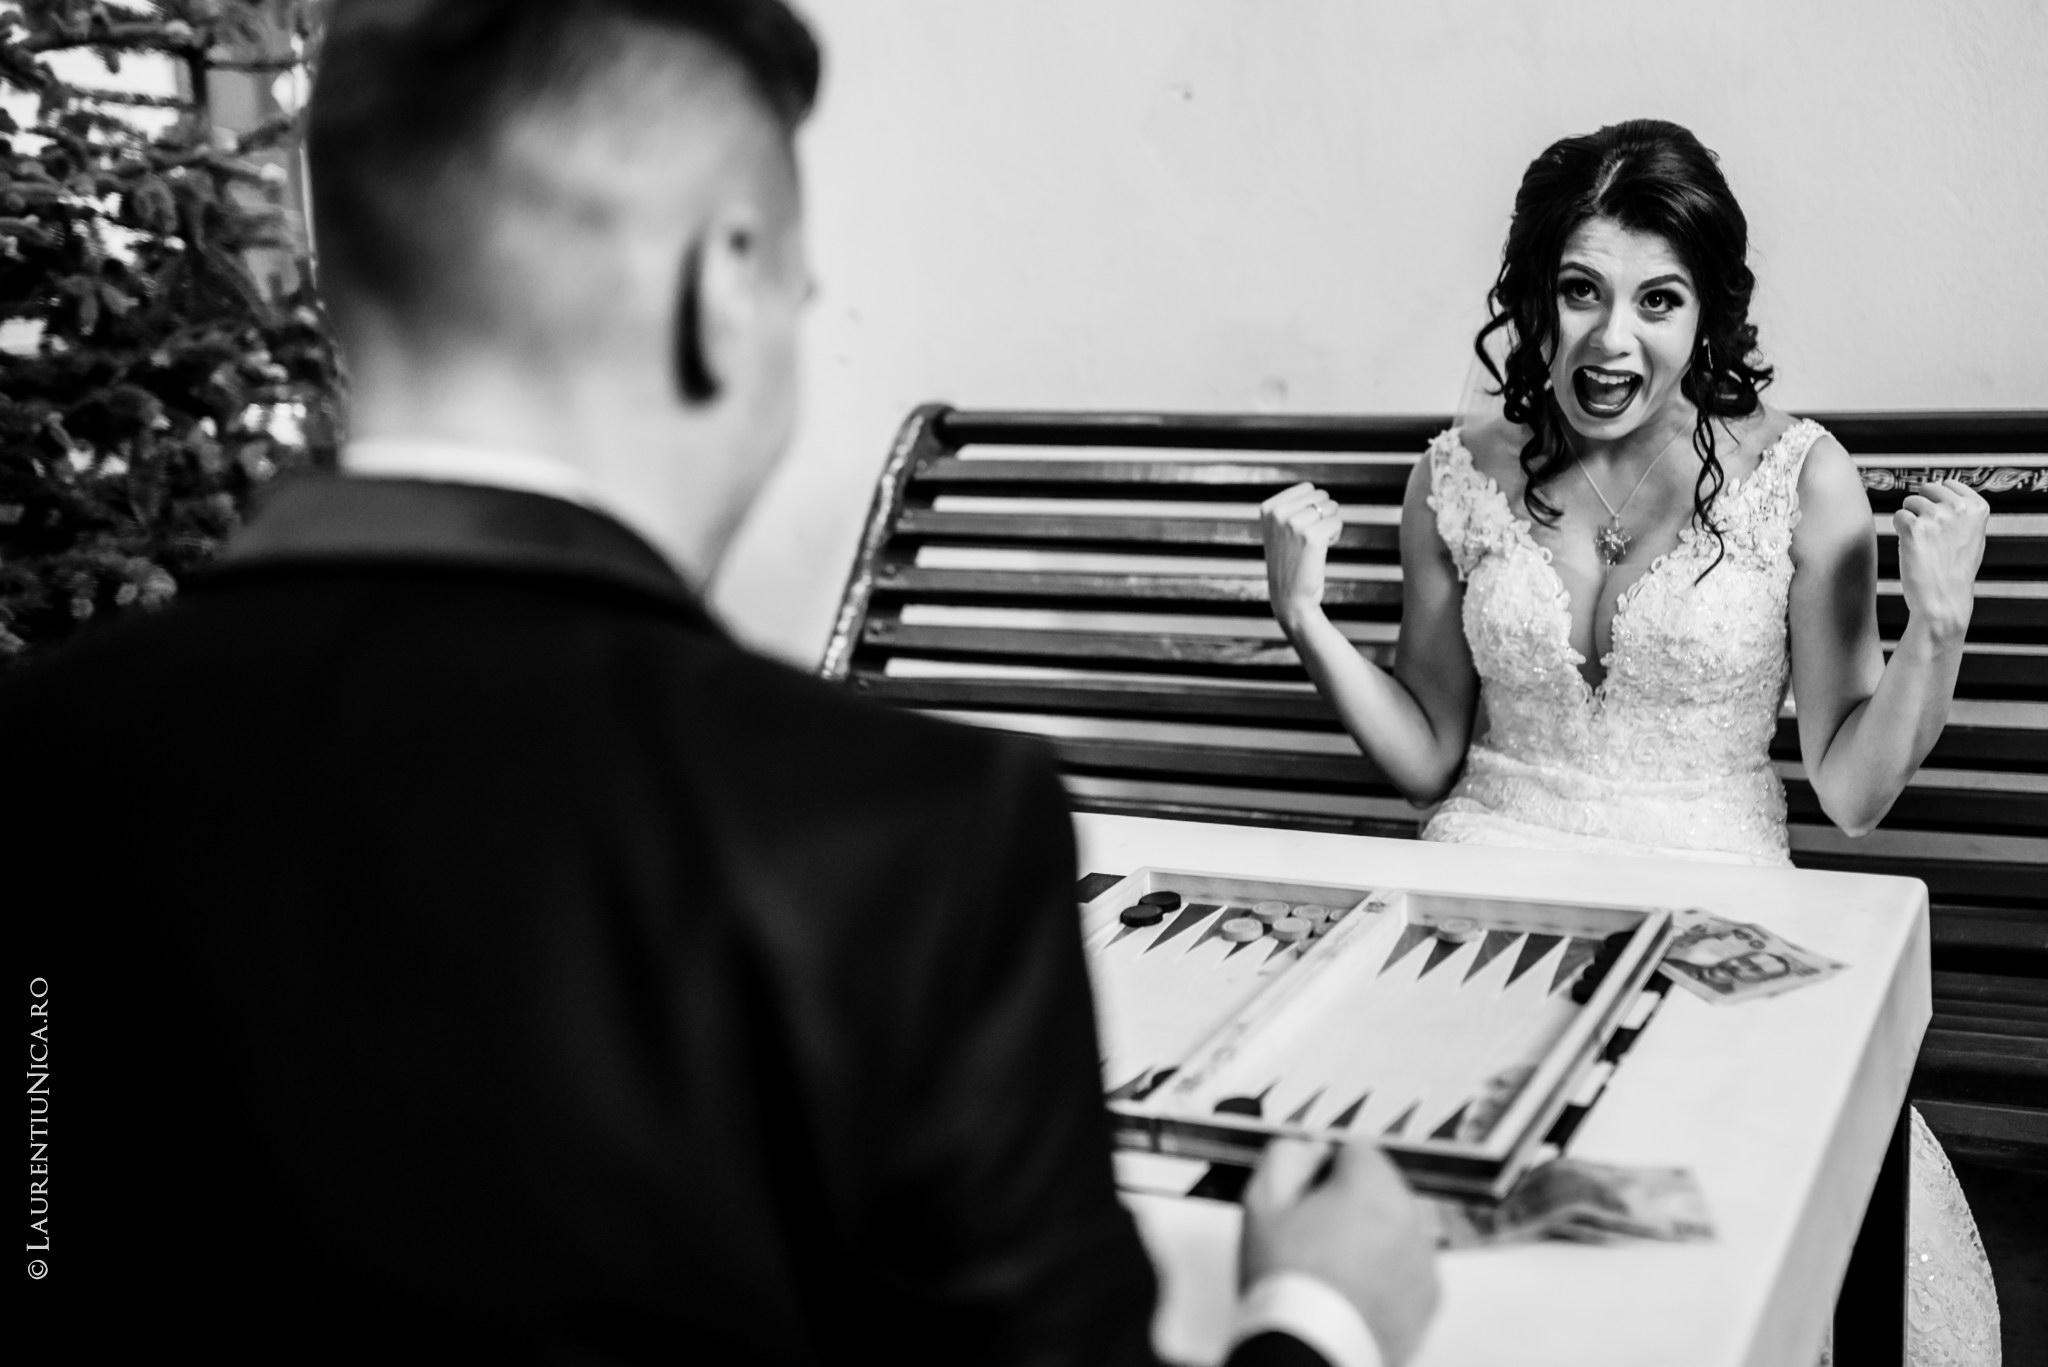 fotografii nunta craiova bia alex fotograf nunta laurentiu nica 26 - Bia & Alex | Fotografii nunta | Craiova